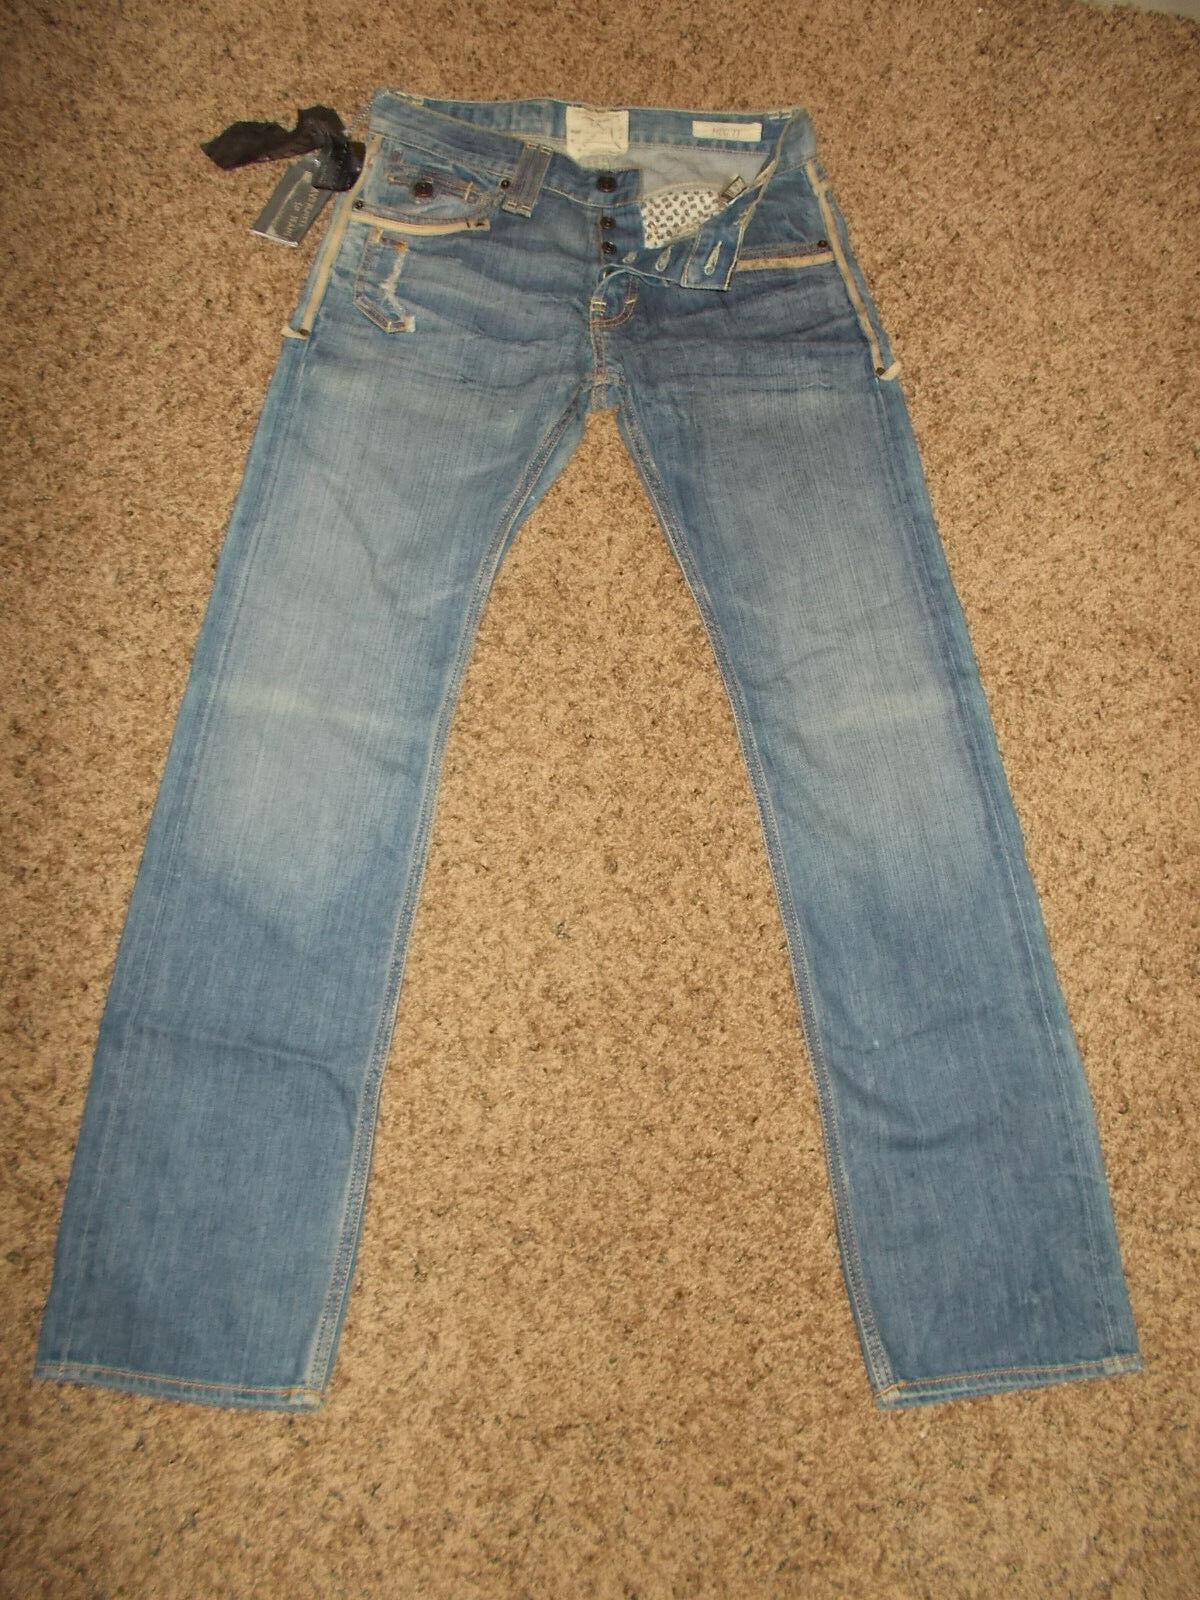 NWT  120.00 Jimmy Taverniti MEG 17 Denim Jeans 30x32 Women's Straight Leg sku2